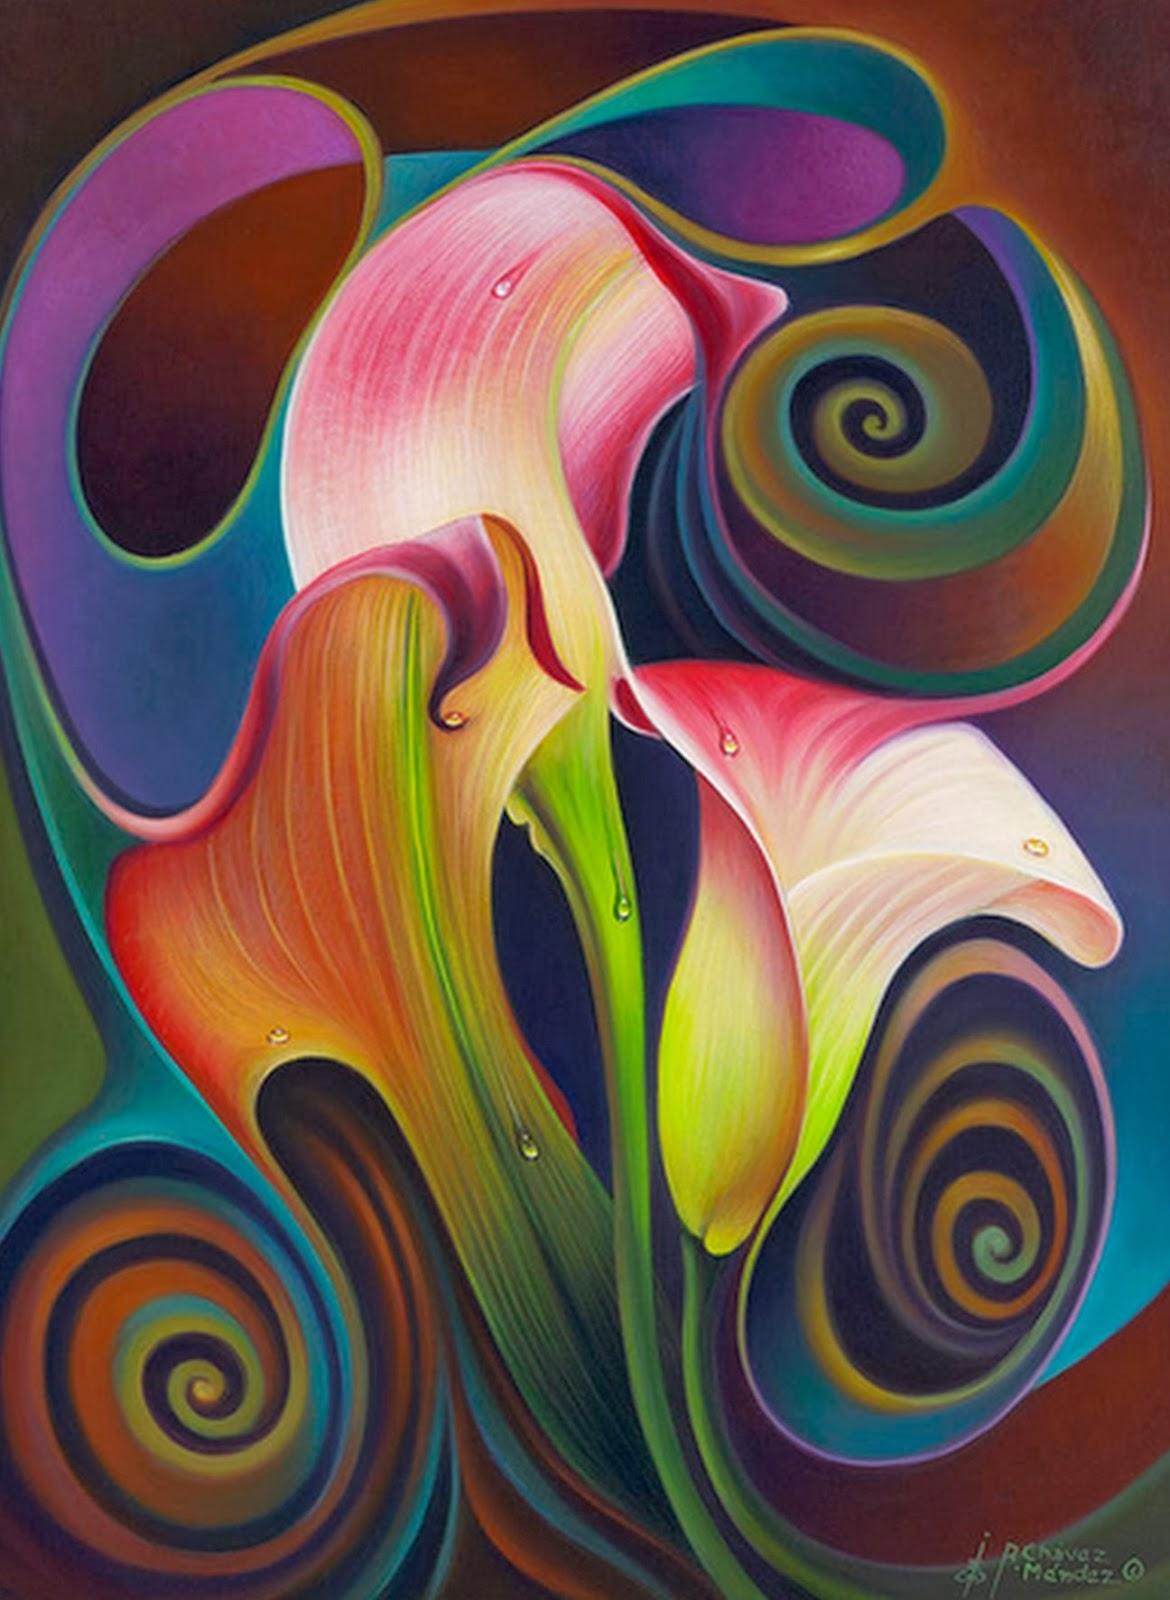 Cuadros pinturas oleos abstractos modernos pinturas de - Decorarte pinturas ...